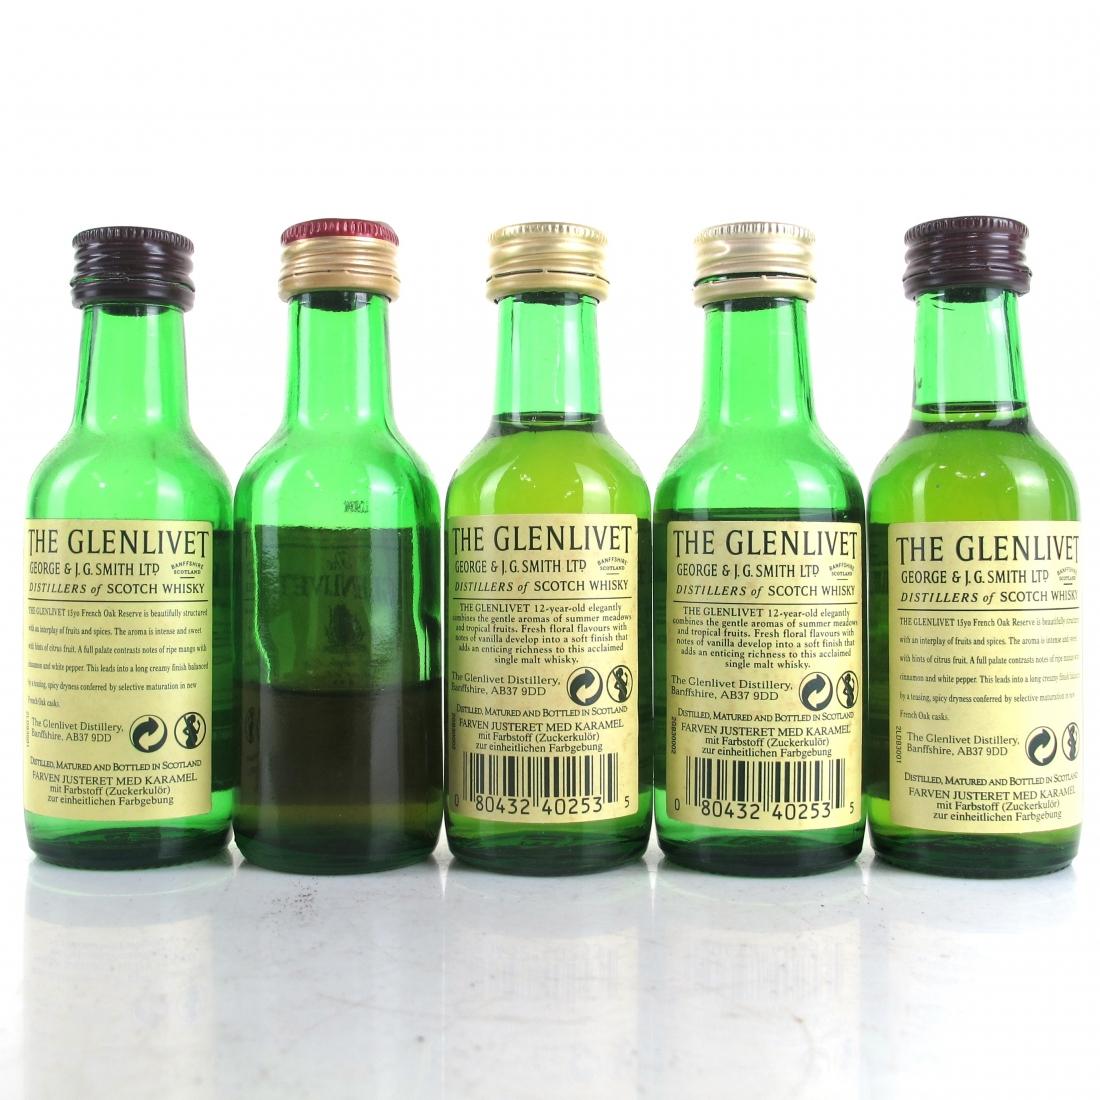 Glenlivet Miniature Selection 5 x 5cl